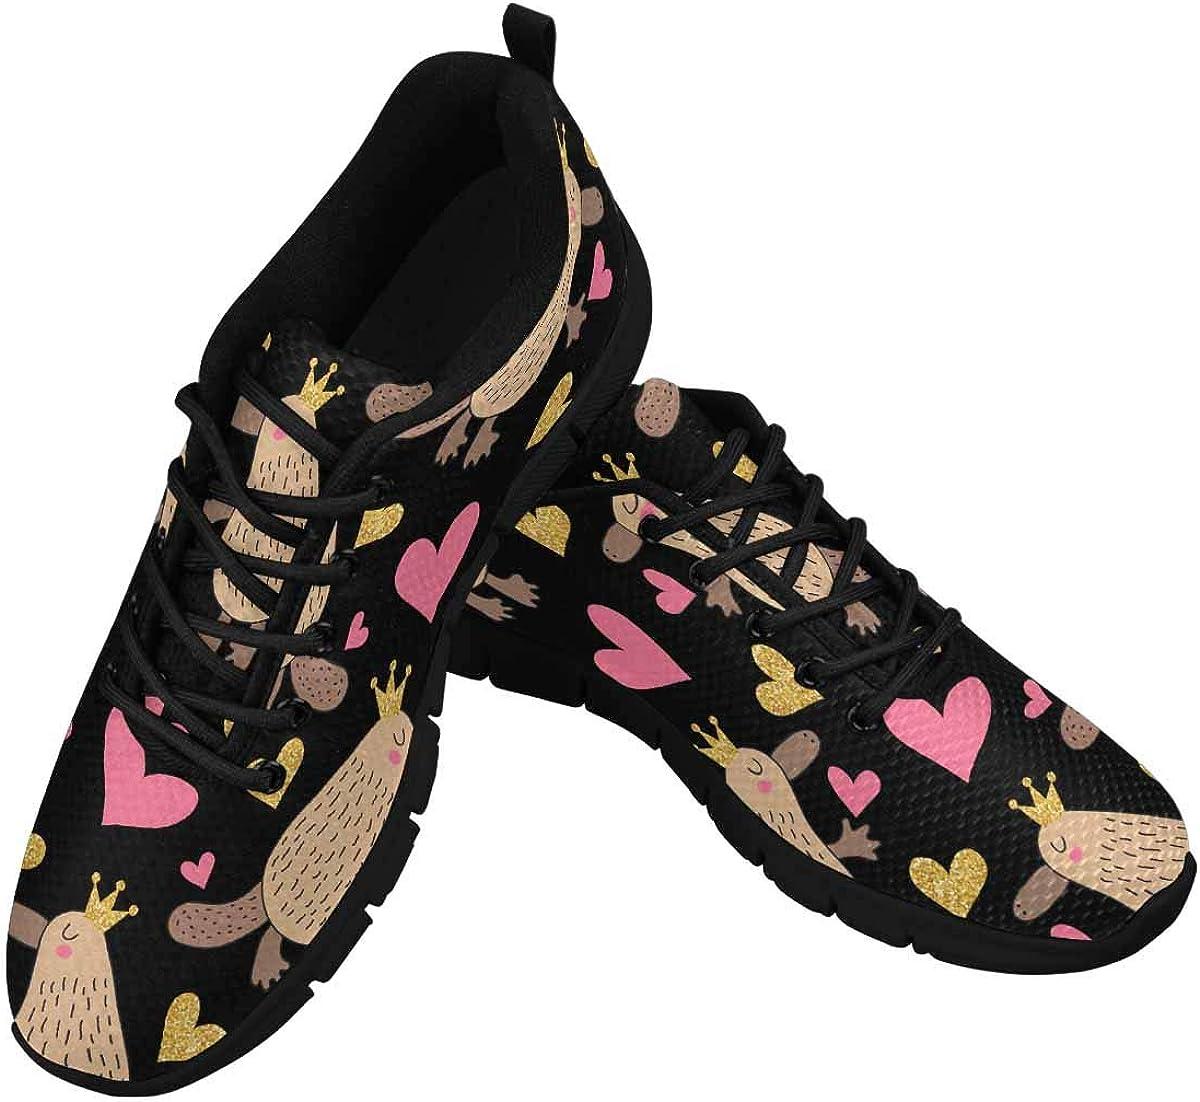 INTERESTPRINT Cute Cartoon Platypus Women's Athletic Walking Running Sneakers Comfortable Lightweight Shoes